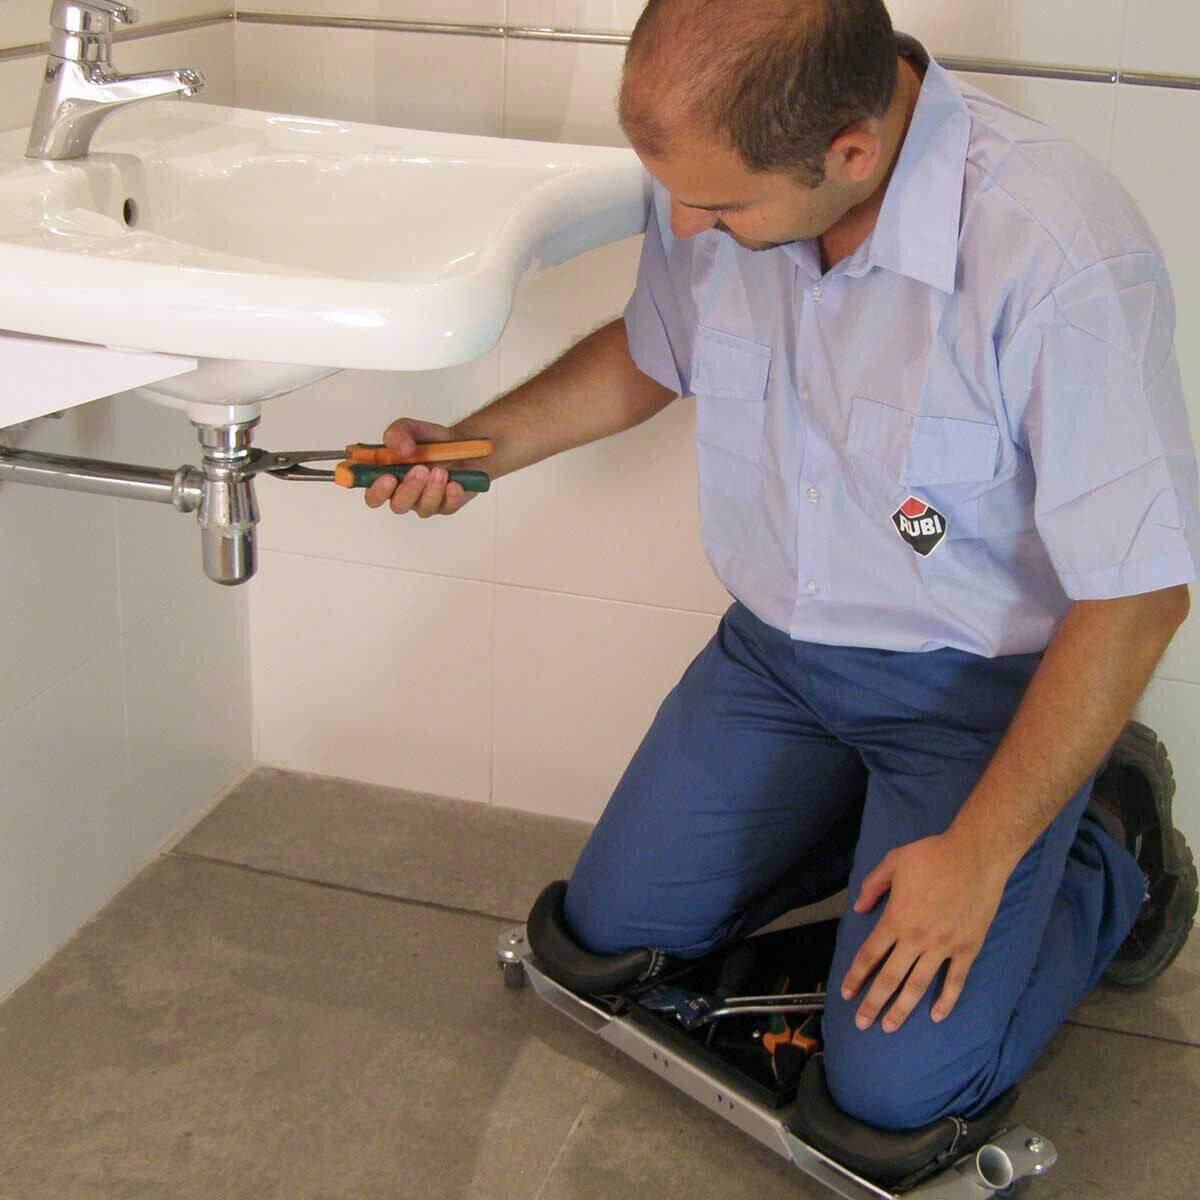 Rubi SR1 Knee Roller In Use